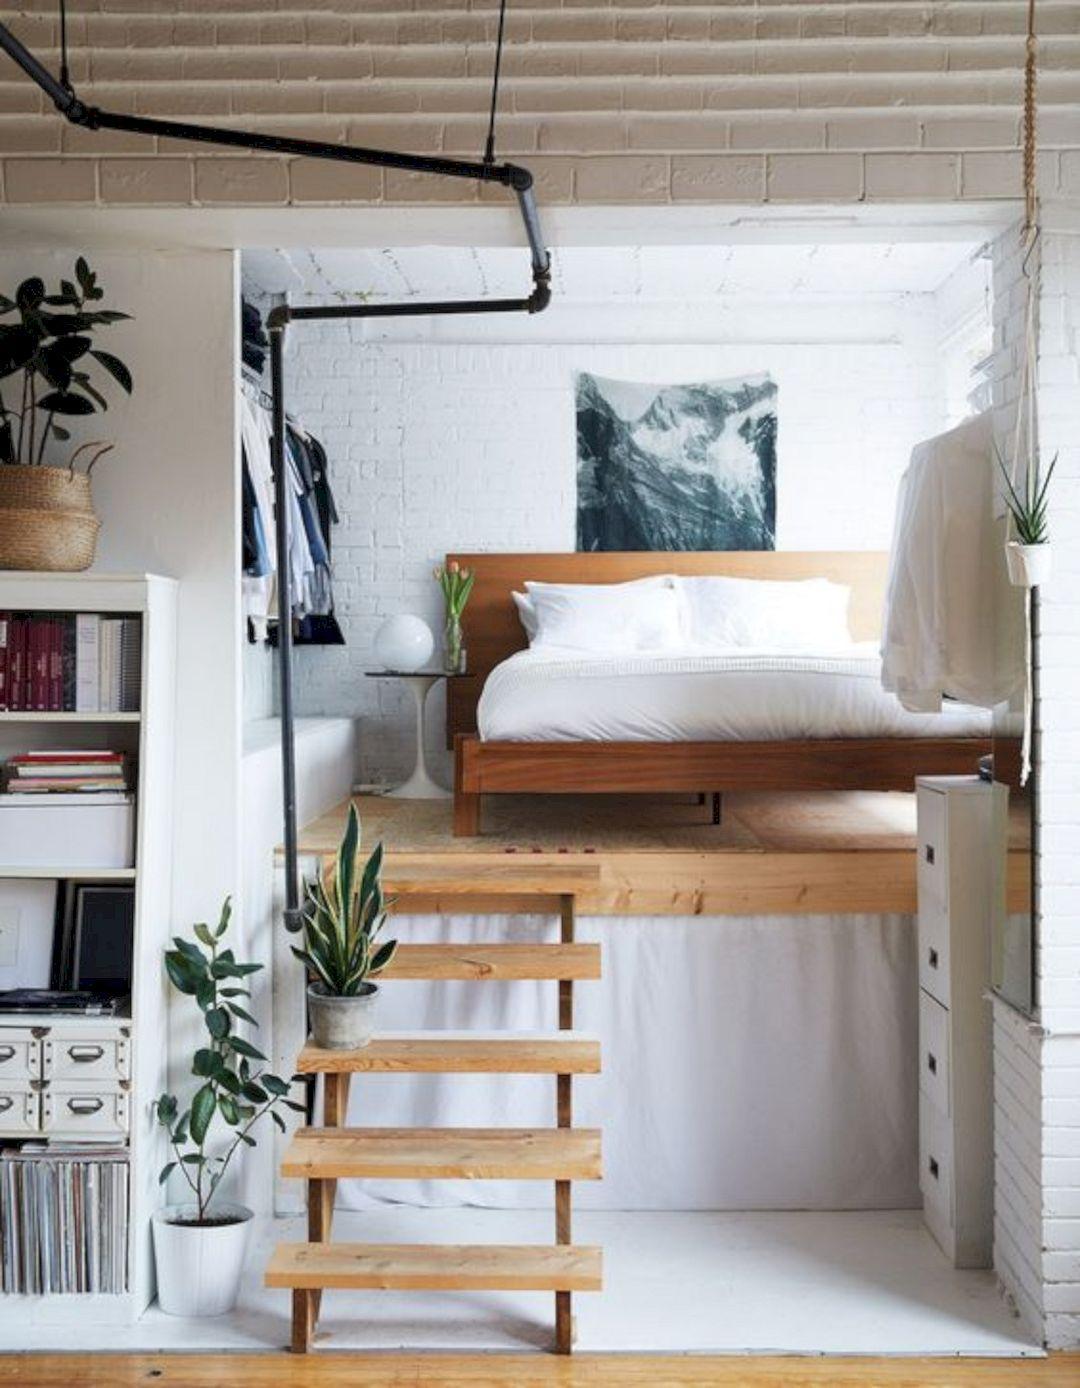 15 Furniture Ideas to Enhance The Interior